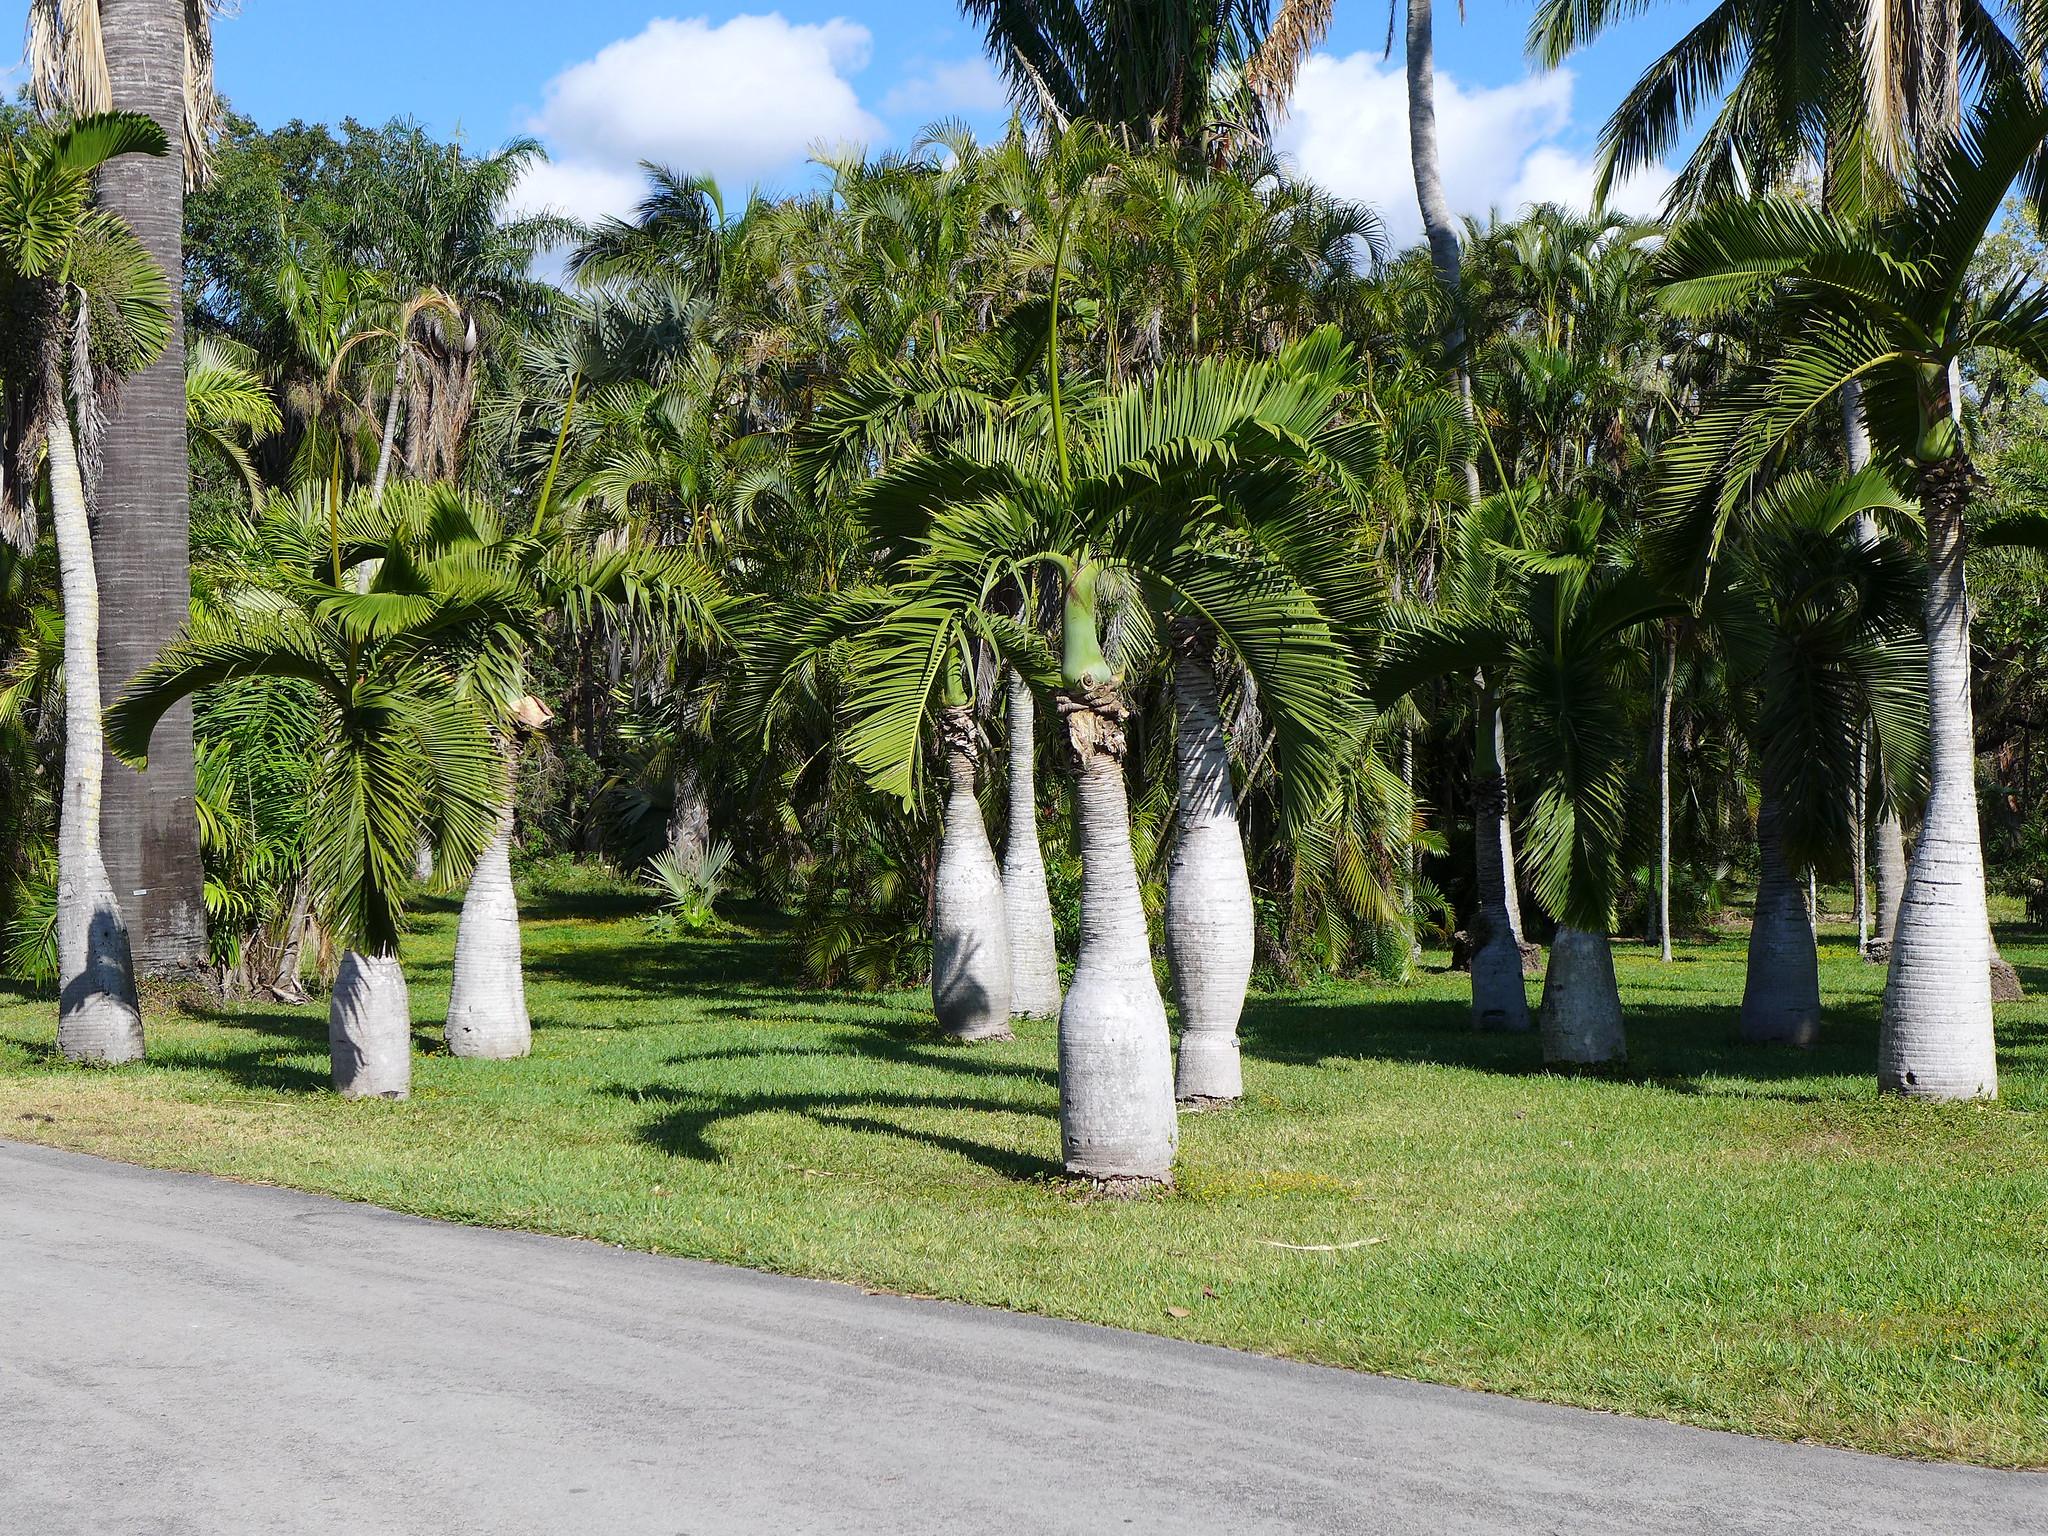 La palmera botella es una planta perennifolia